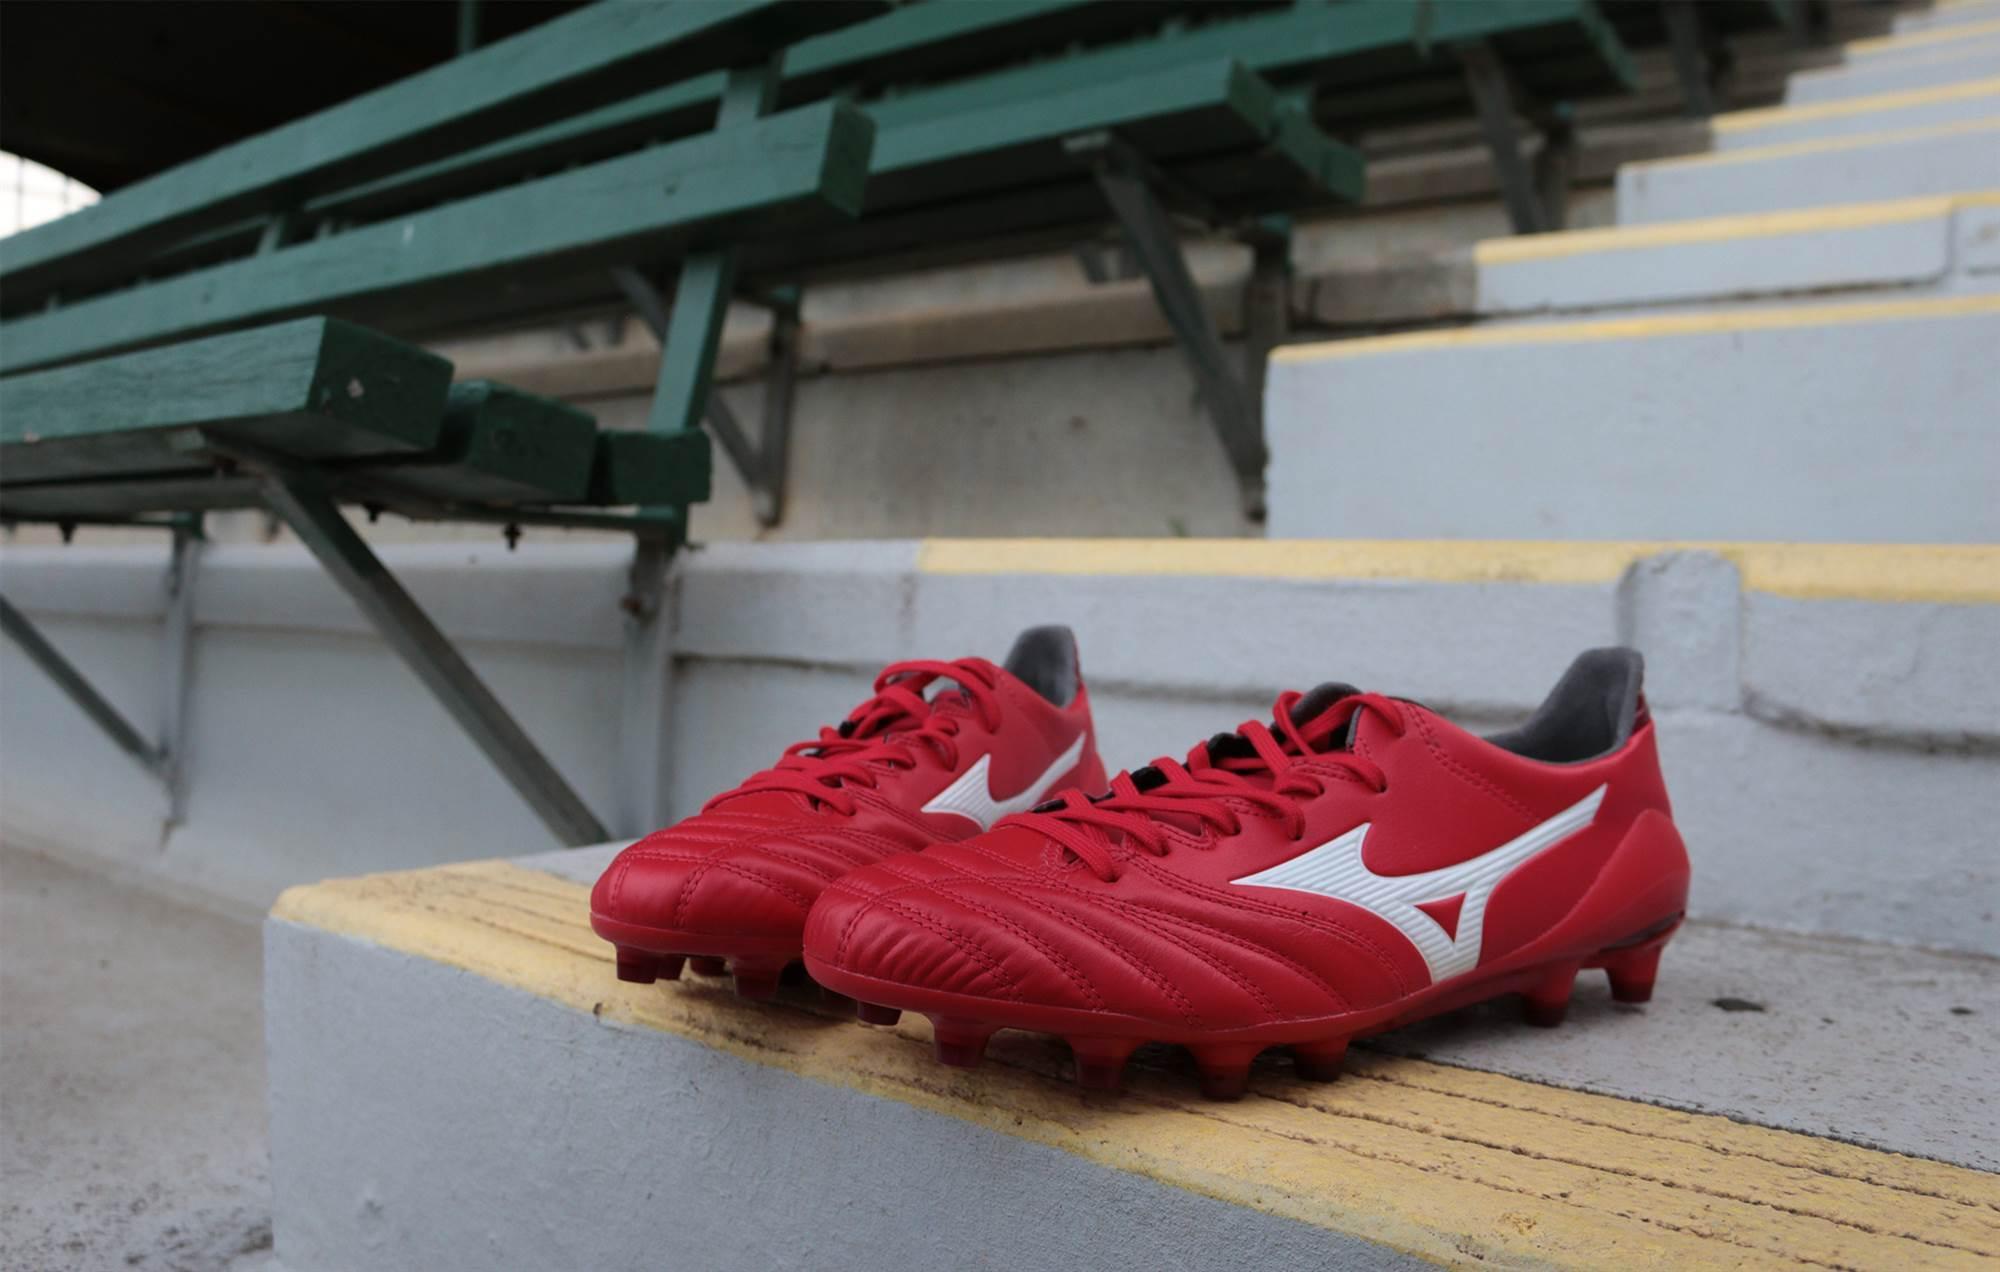 competitive price 92d64 ce8aa Mizuno release fiery fresh Morelia Neo II - Boots - FTBL Life